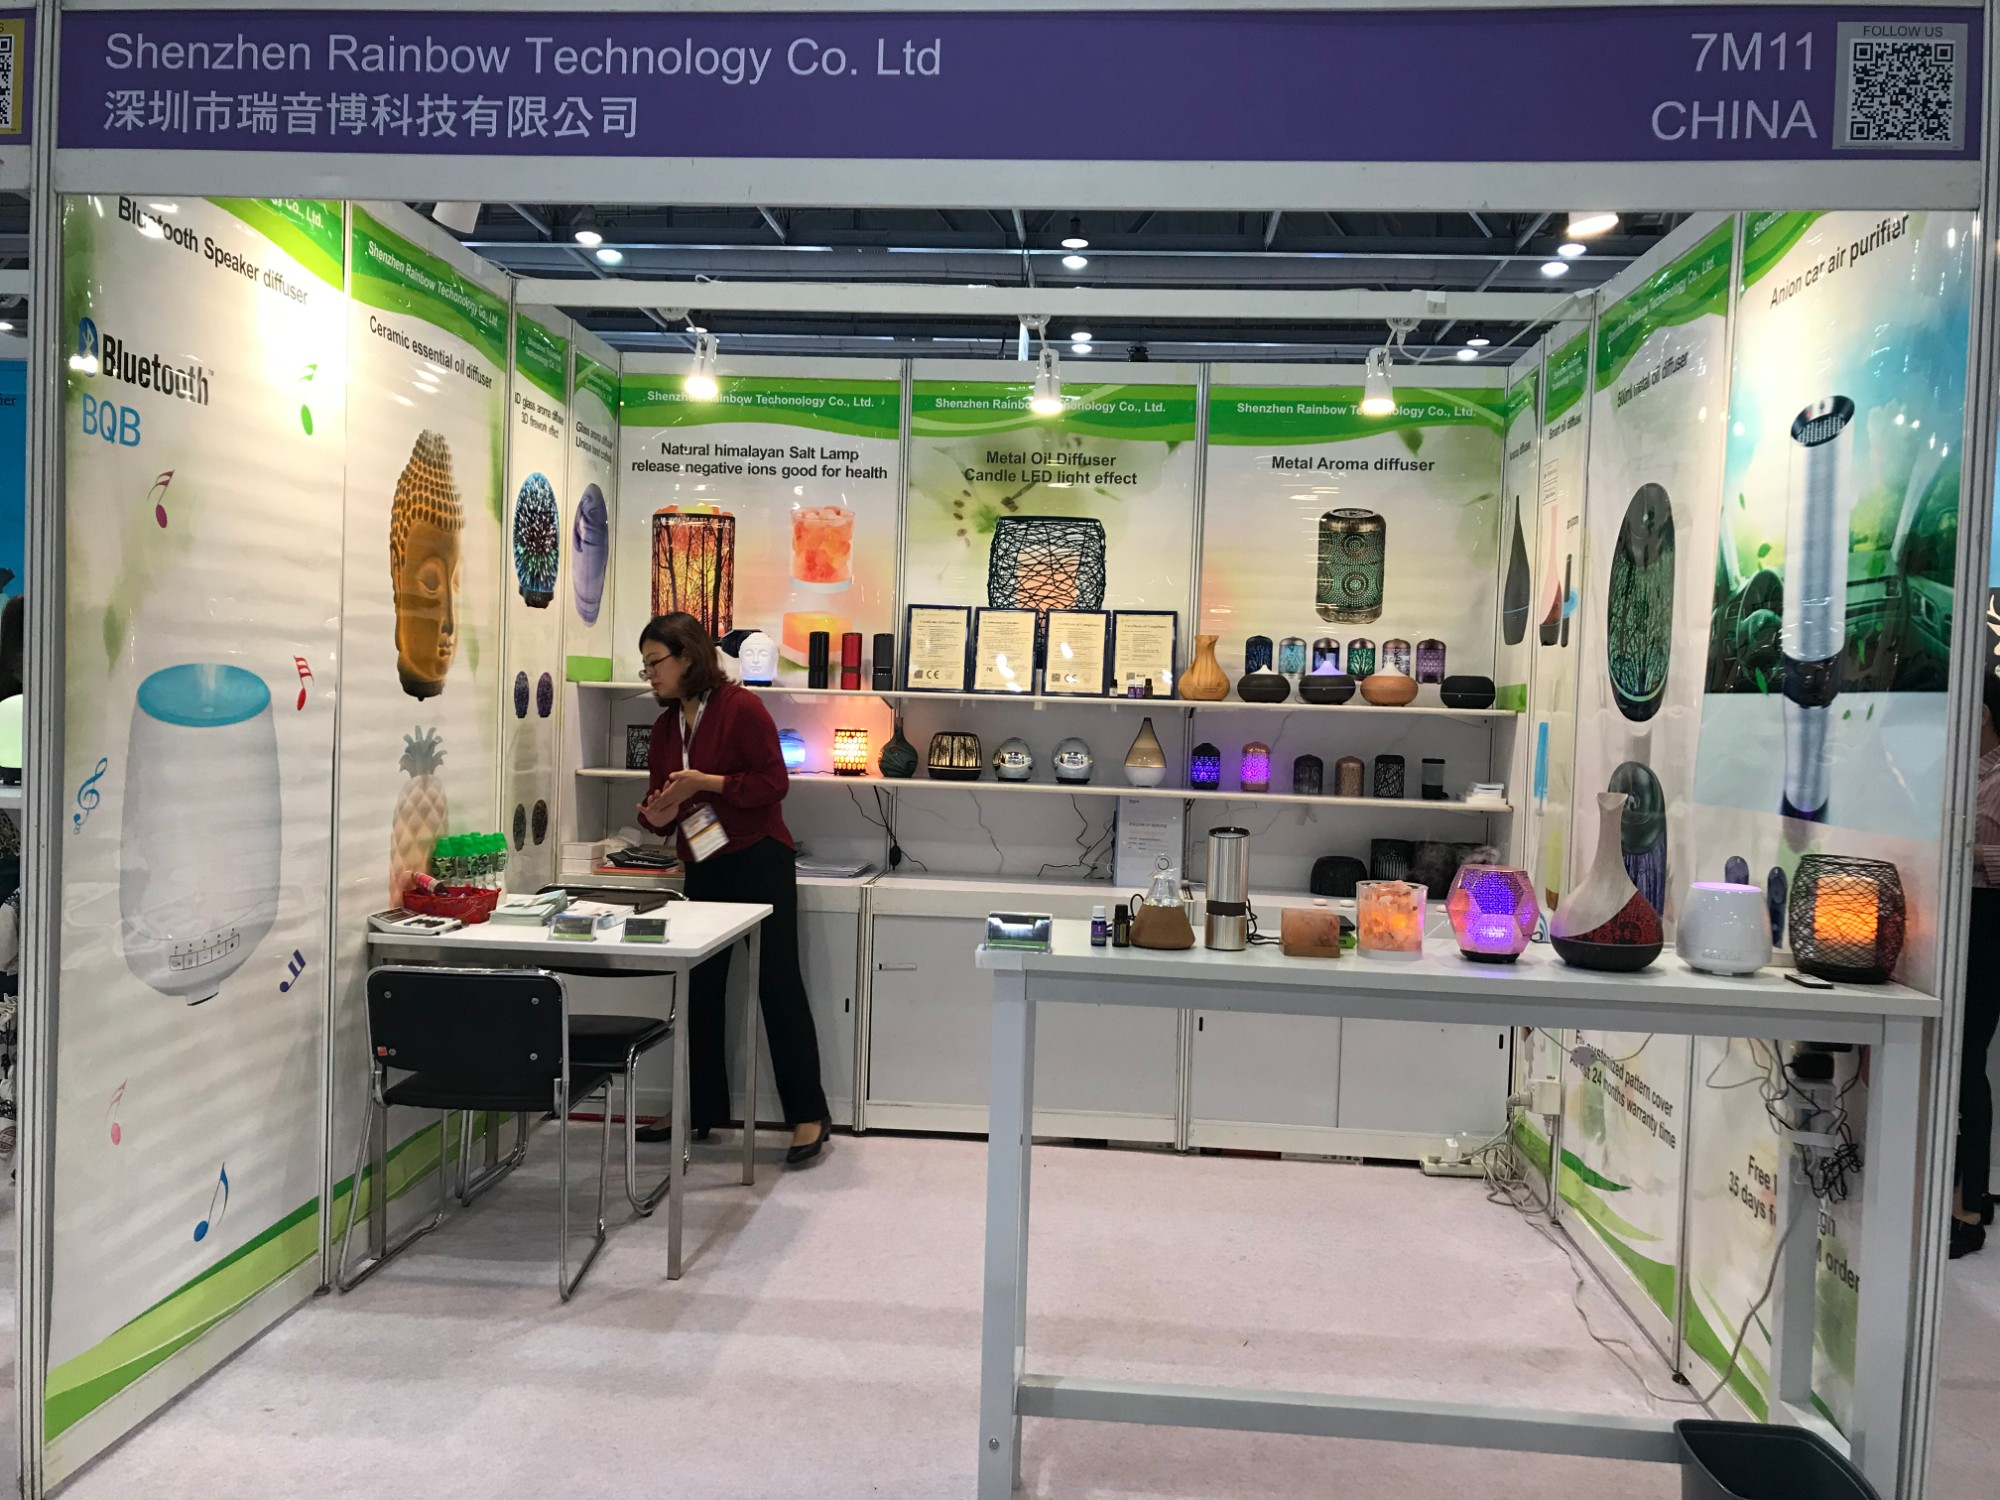 Globalsources Electronics, 2018 in HK (11. bis 14. Oktober)